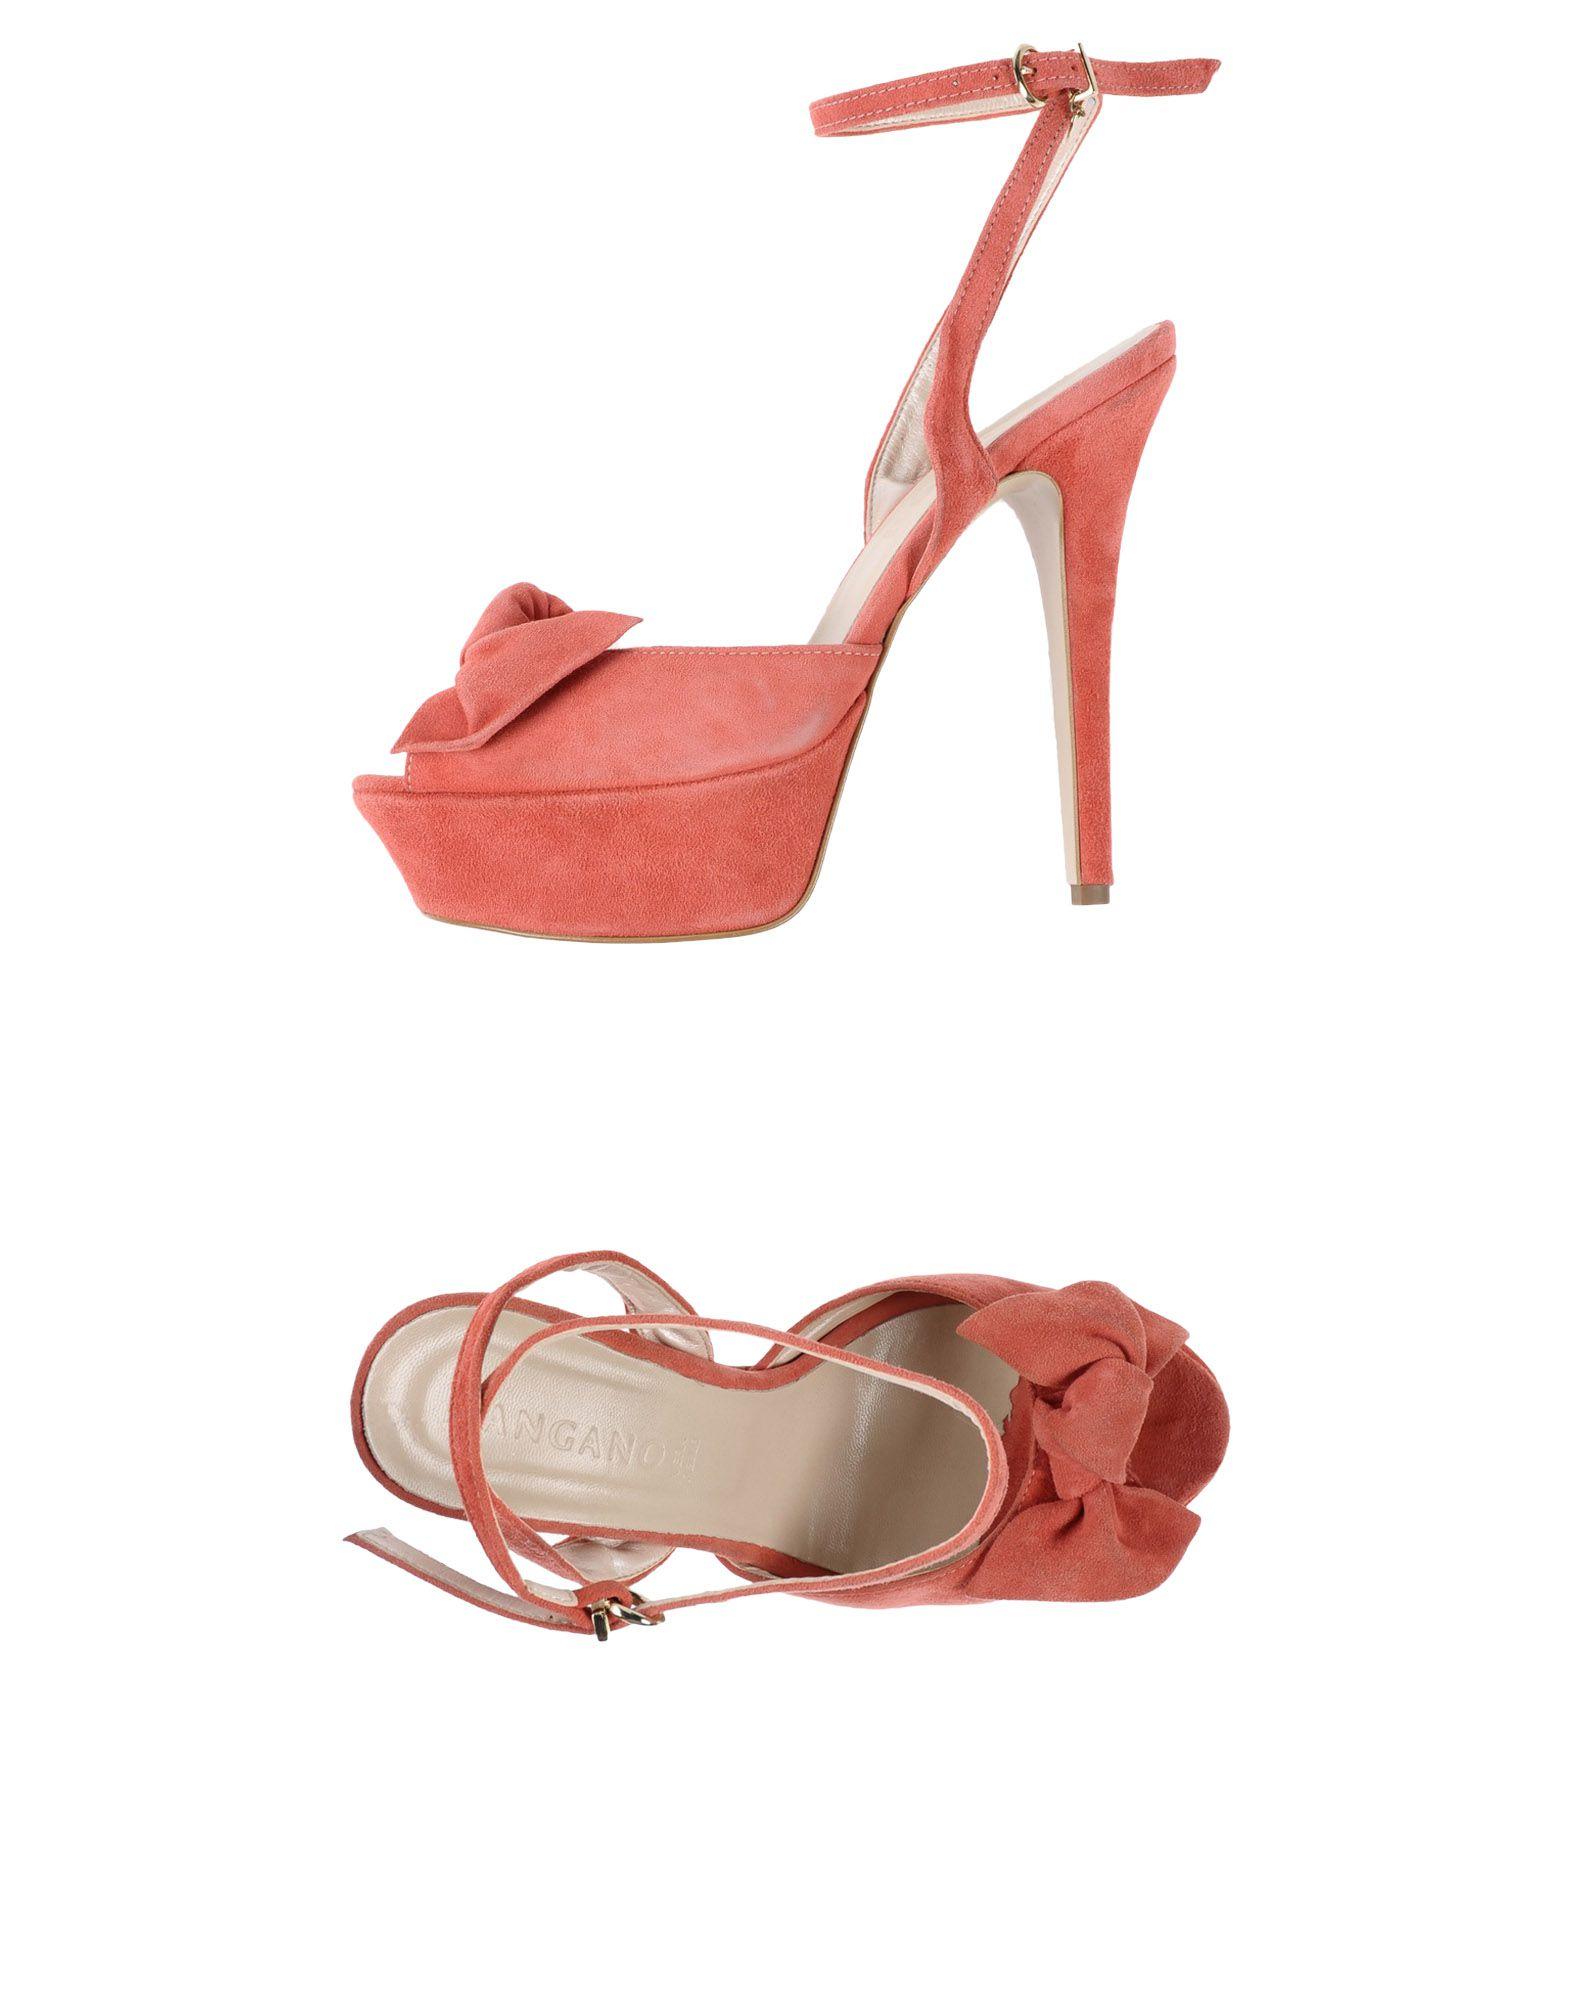 Sandales Mangano Femme - Sandales Mangano sur